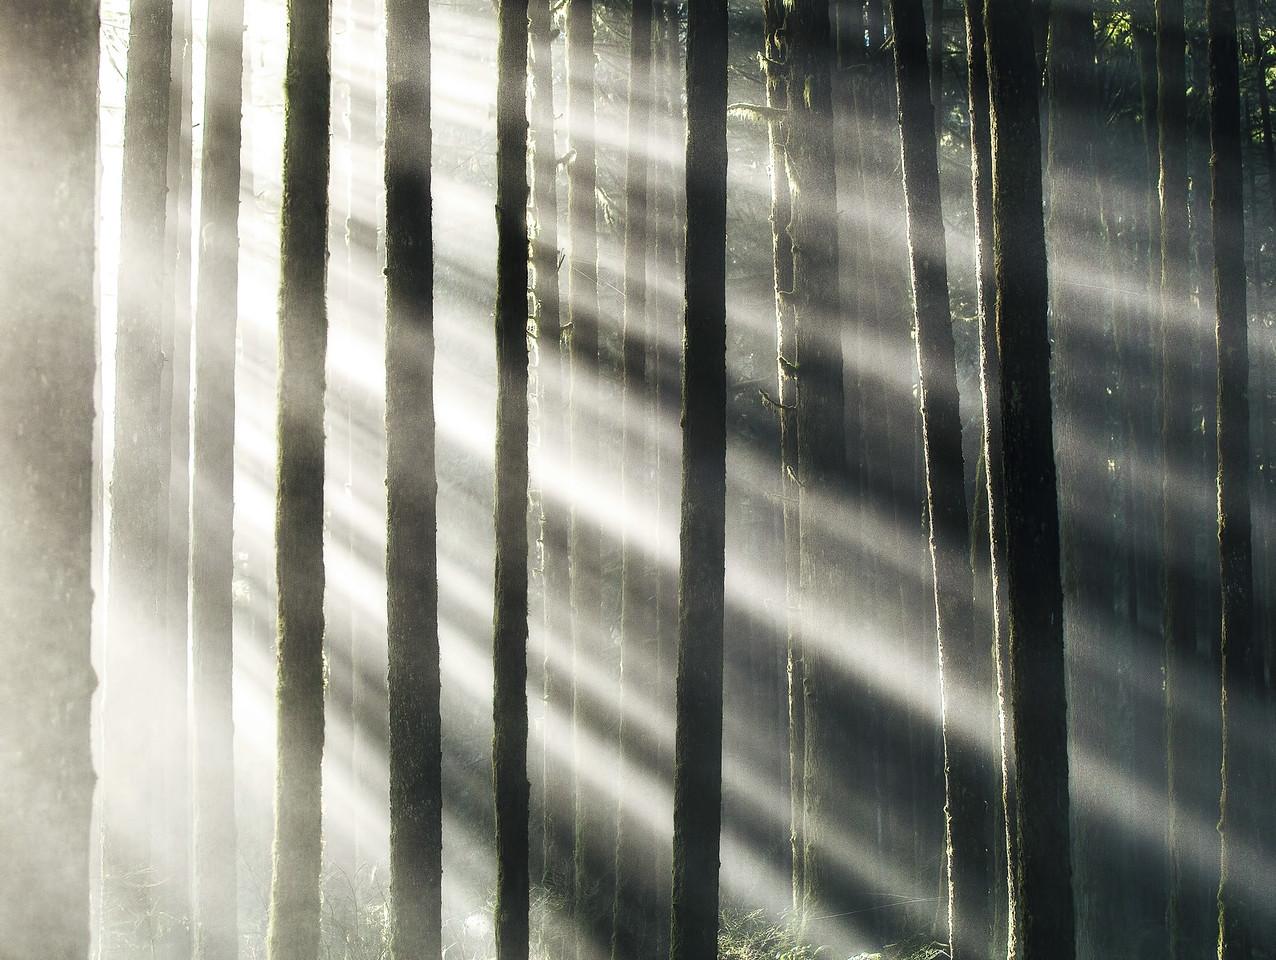 Forest Sunrays in British Columbia